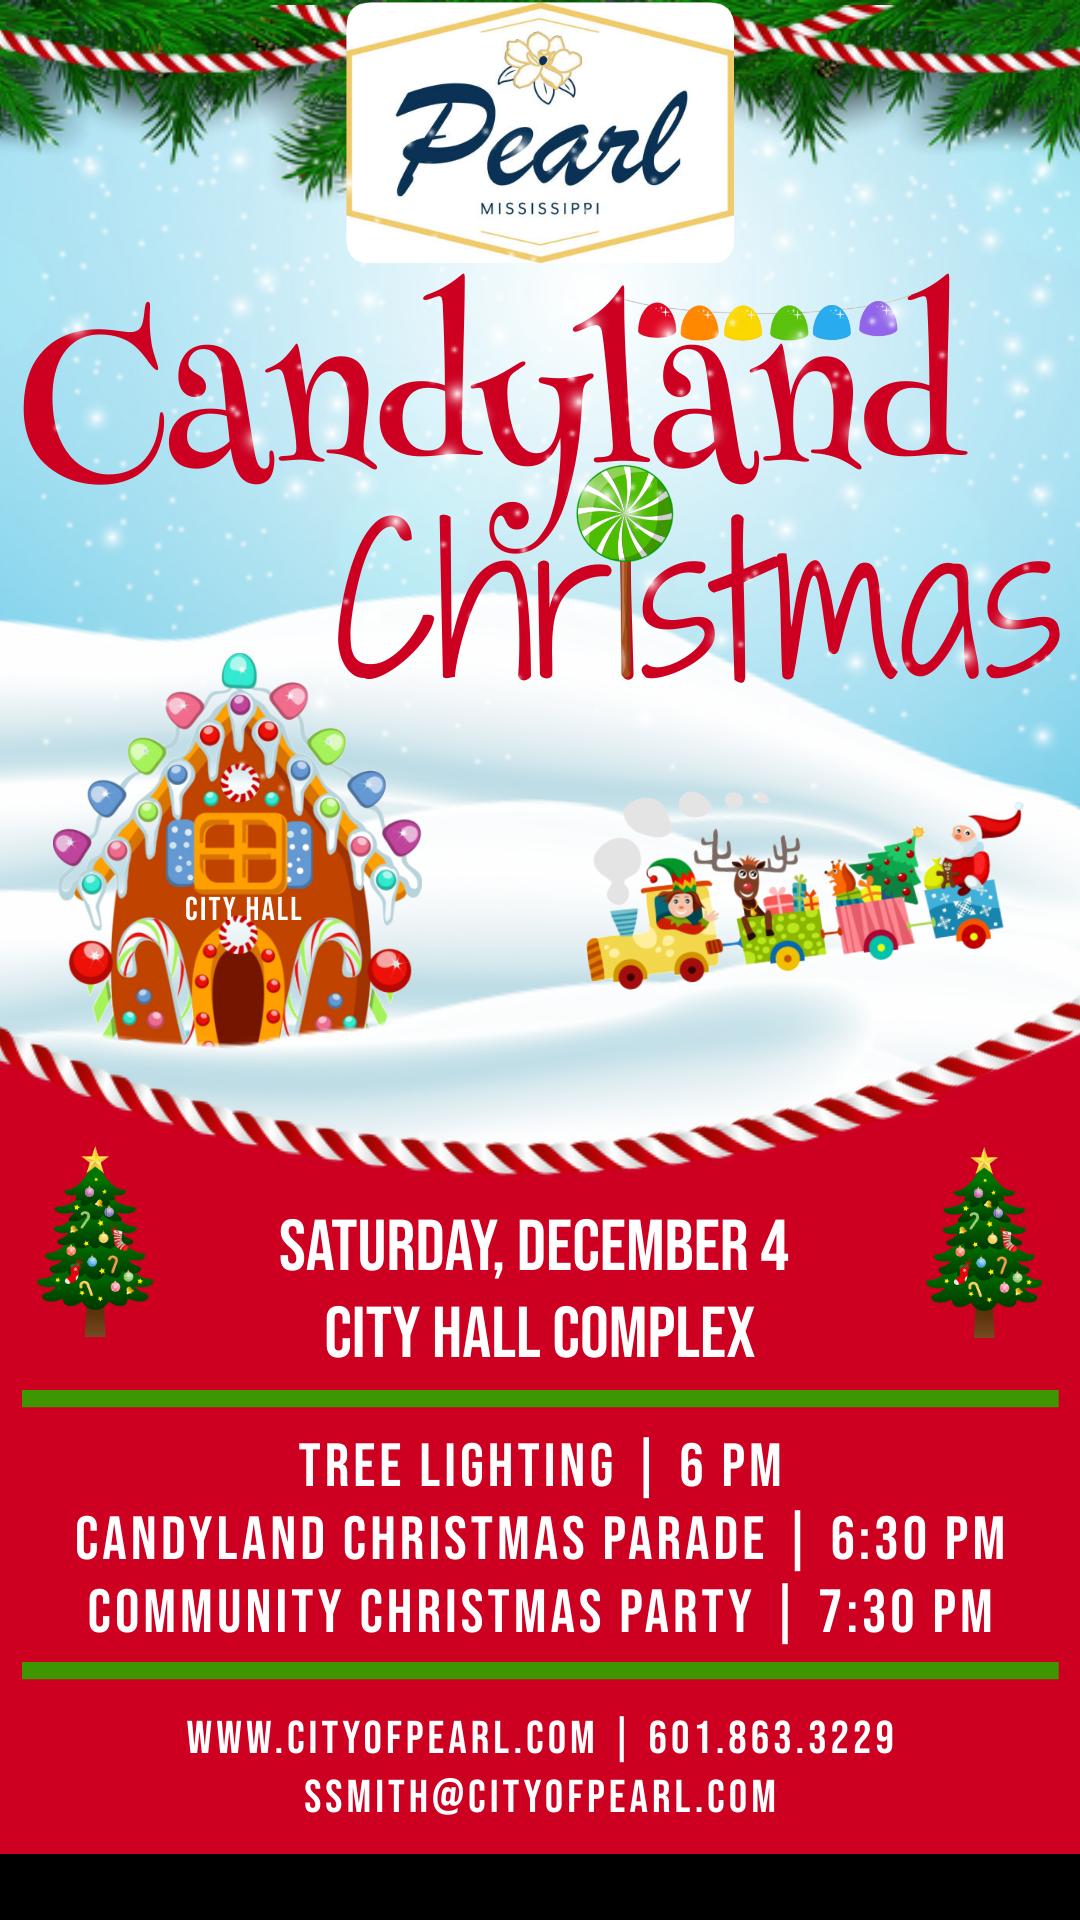 Candyland Christmas 2021